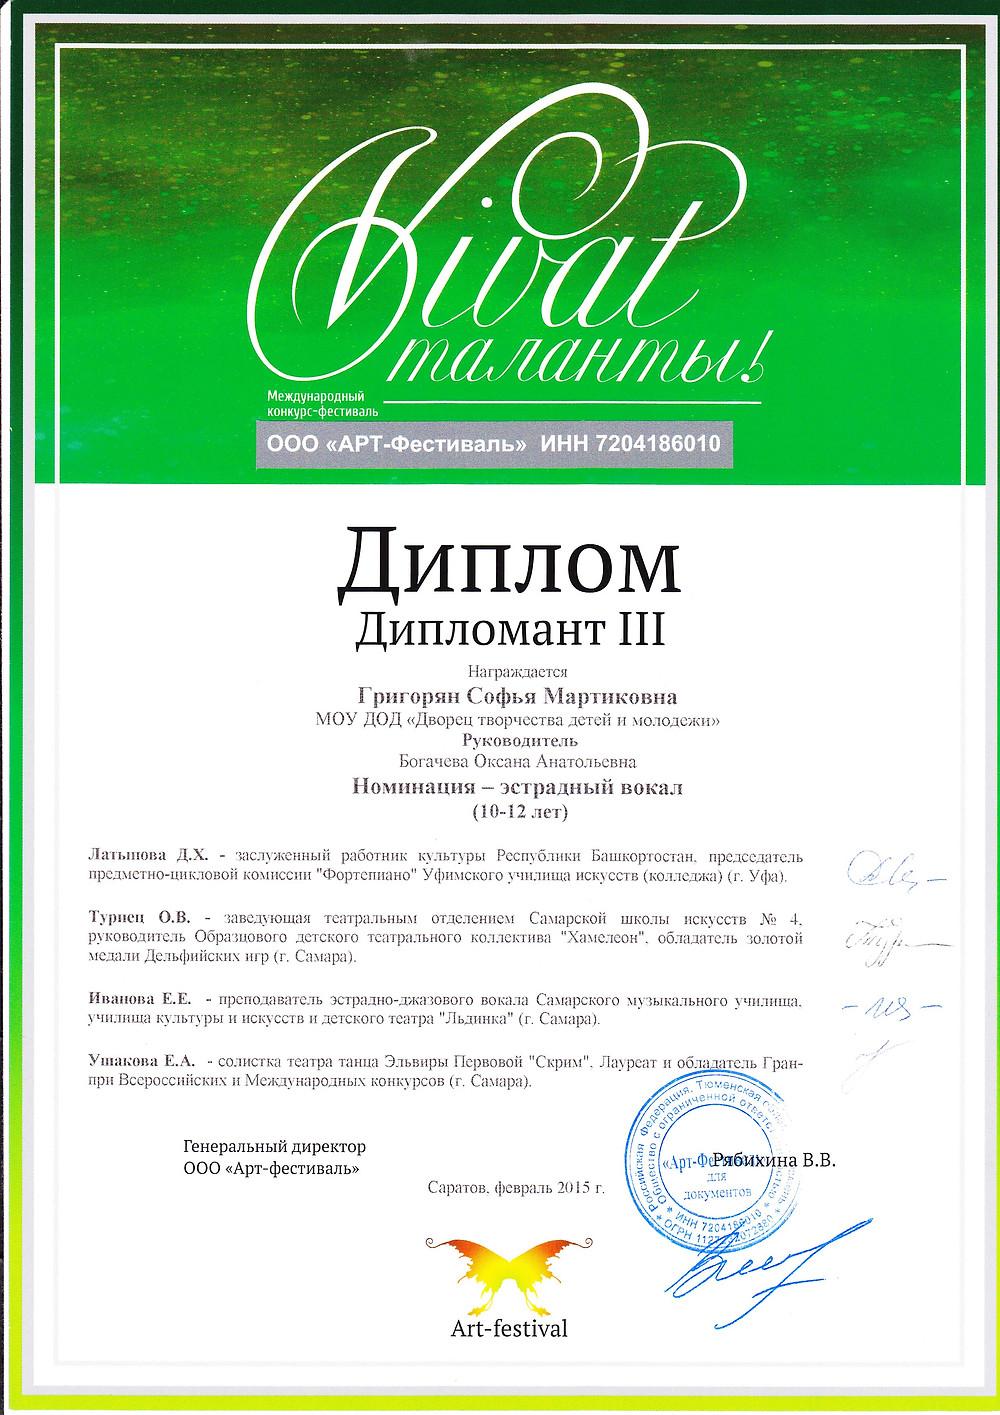 Григорян Софья